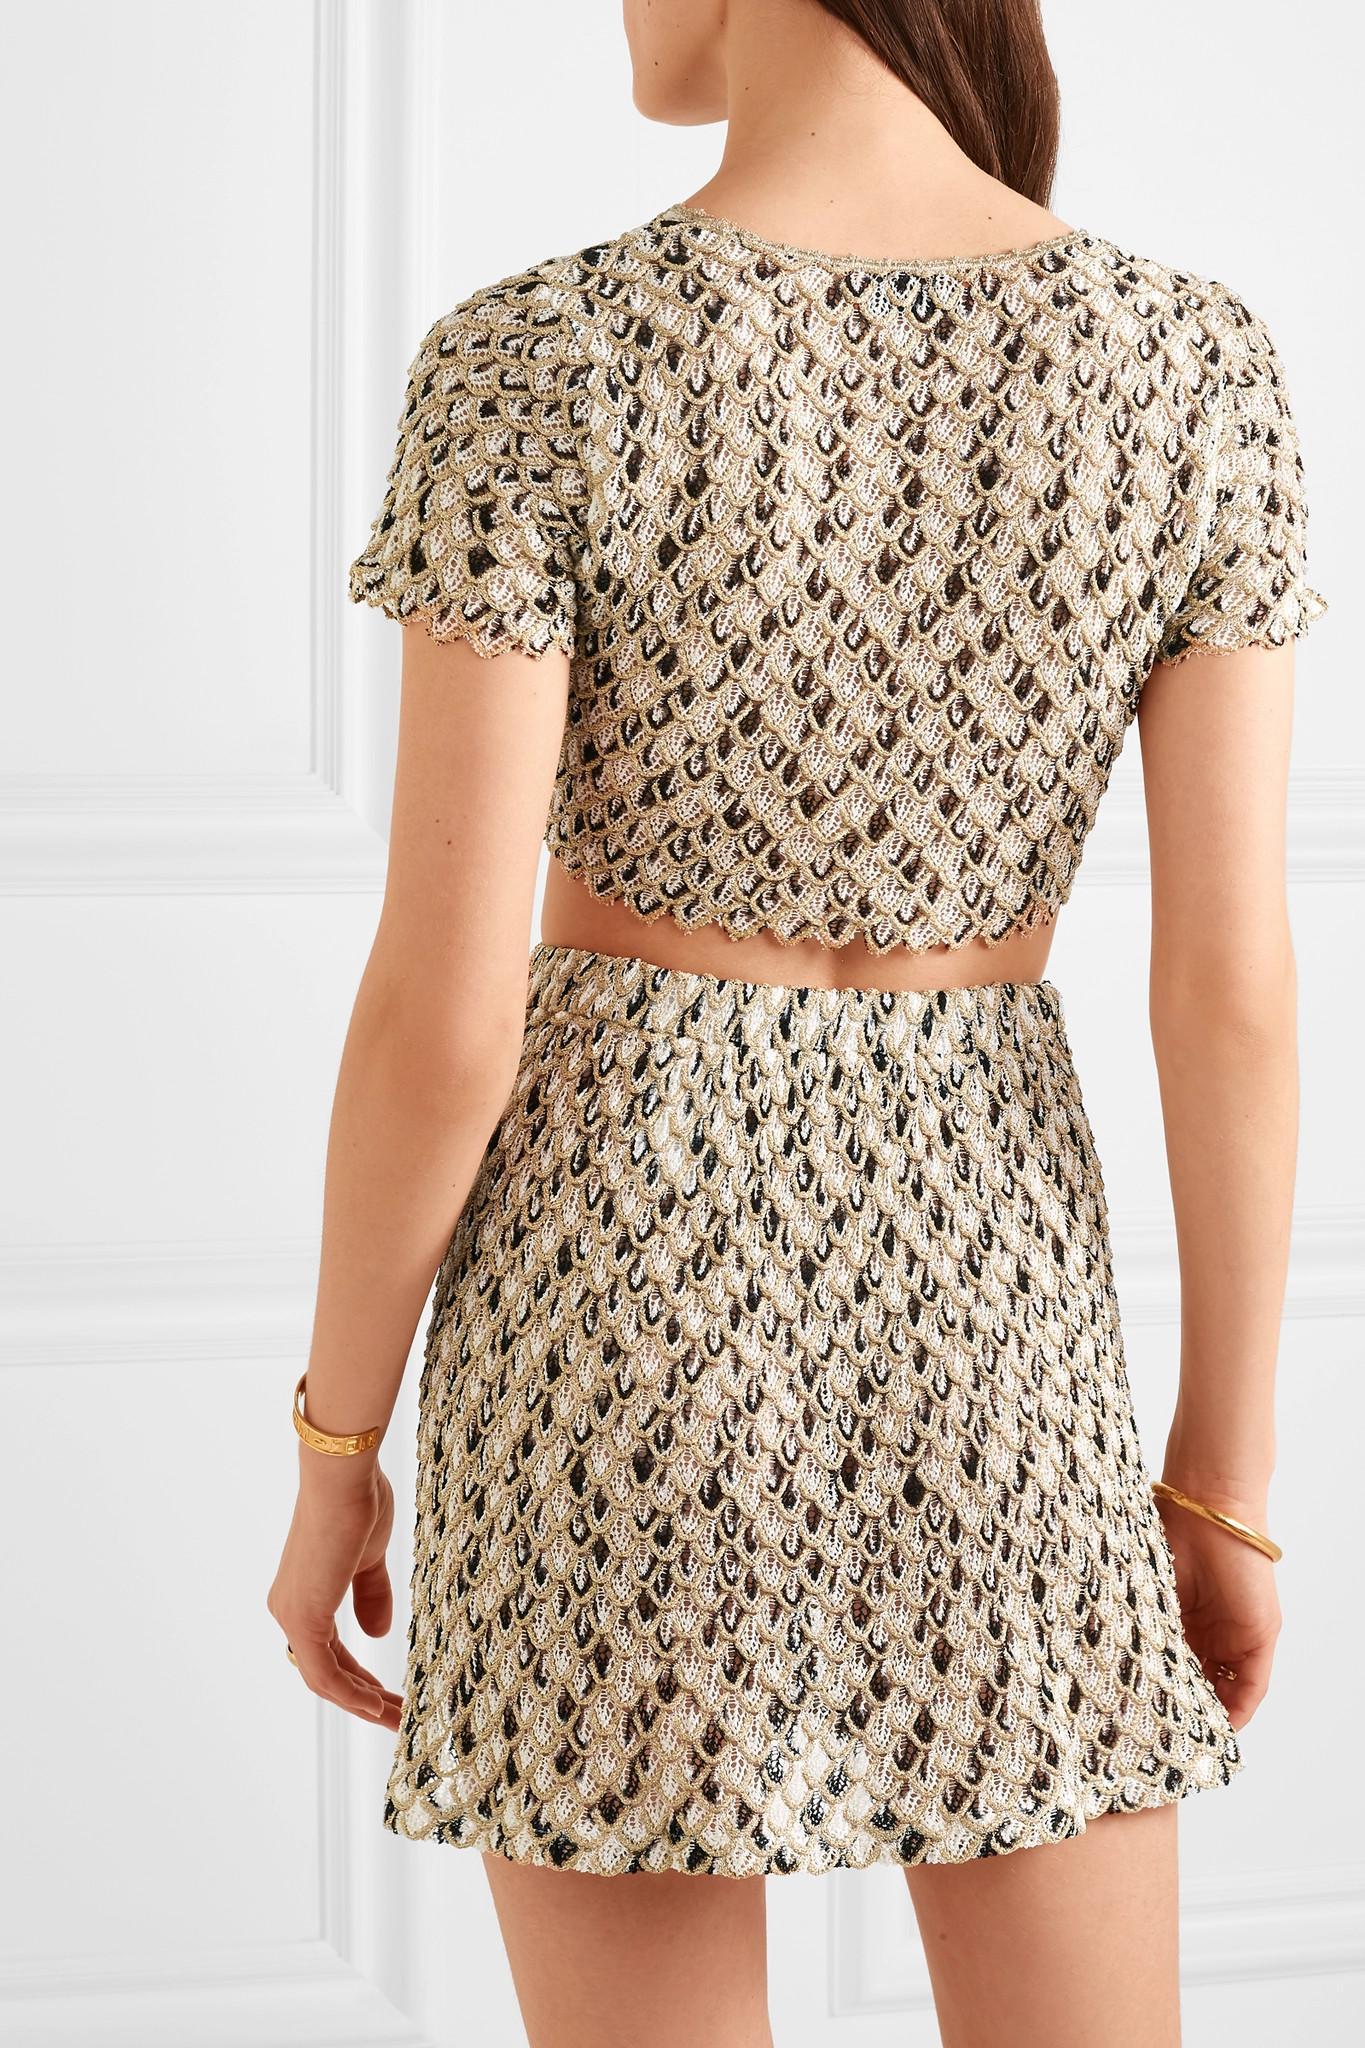 2d4d154e73c338 Lyst - Missoni Cropped Metallic Crochet-knit Top in Metallic